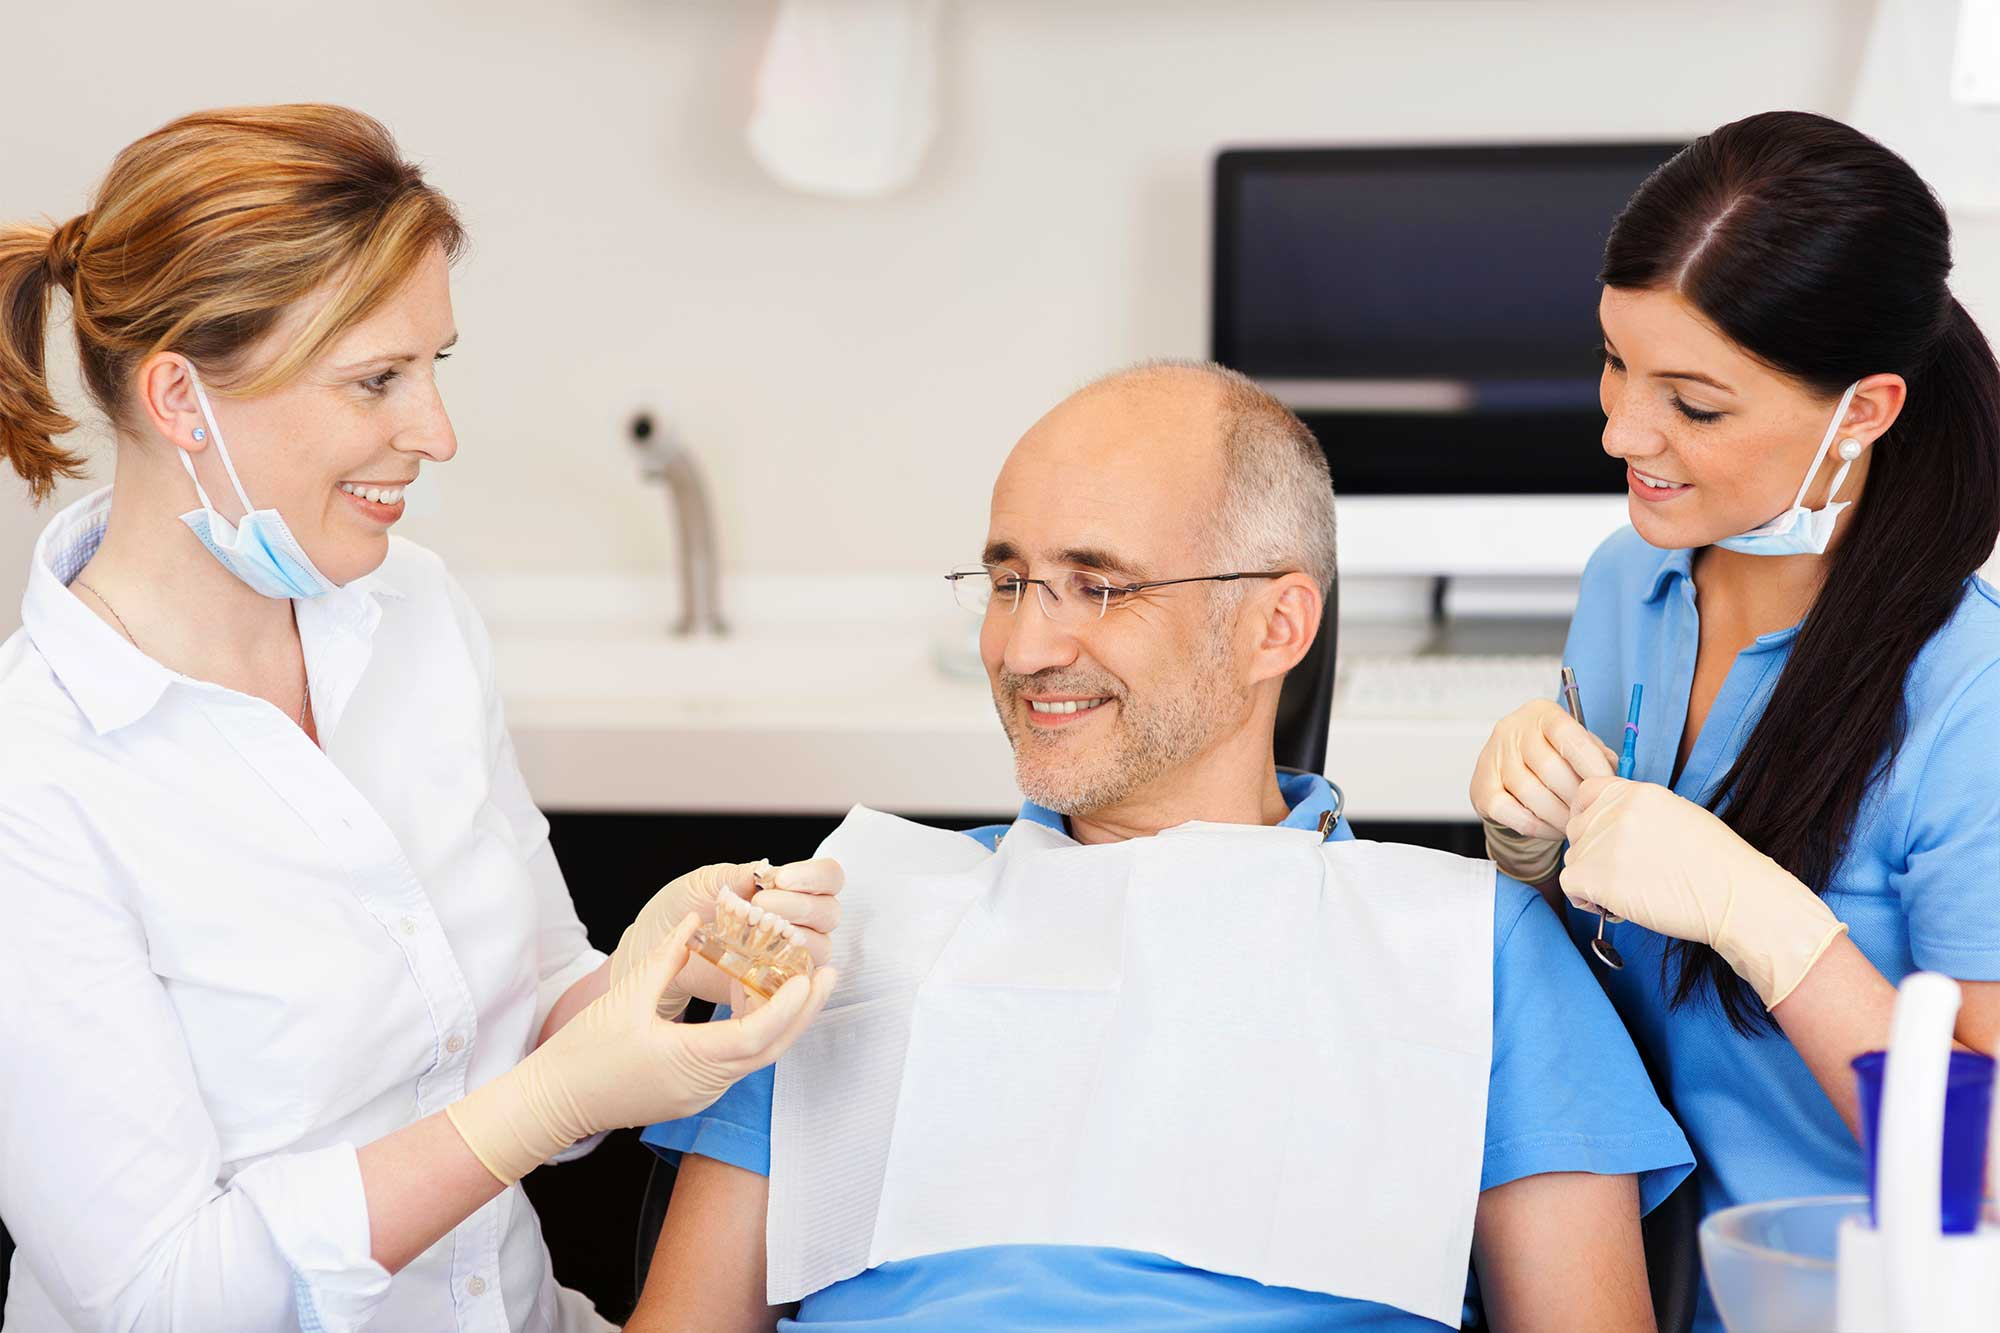 http://www.studiosmilecare.it/wp-content/uploads/2015/12/implantologia-dentale.jpg